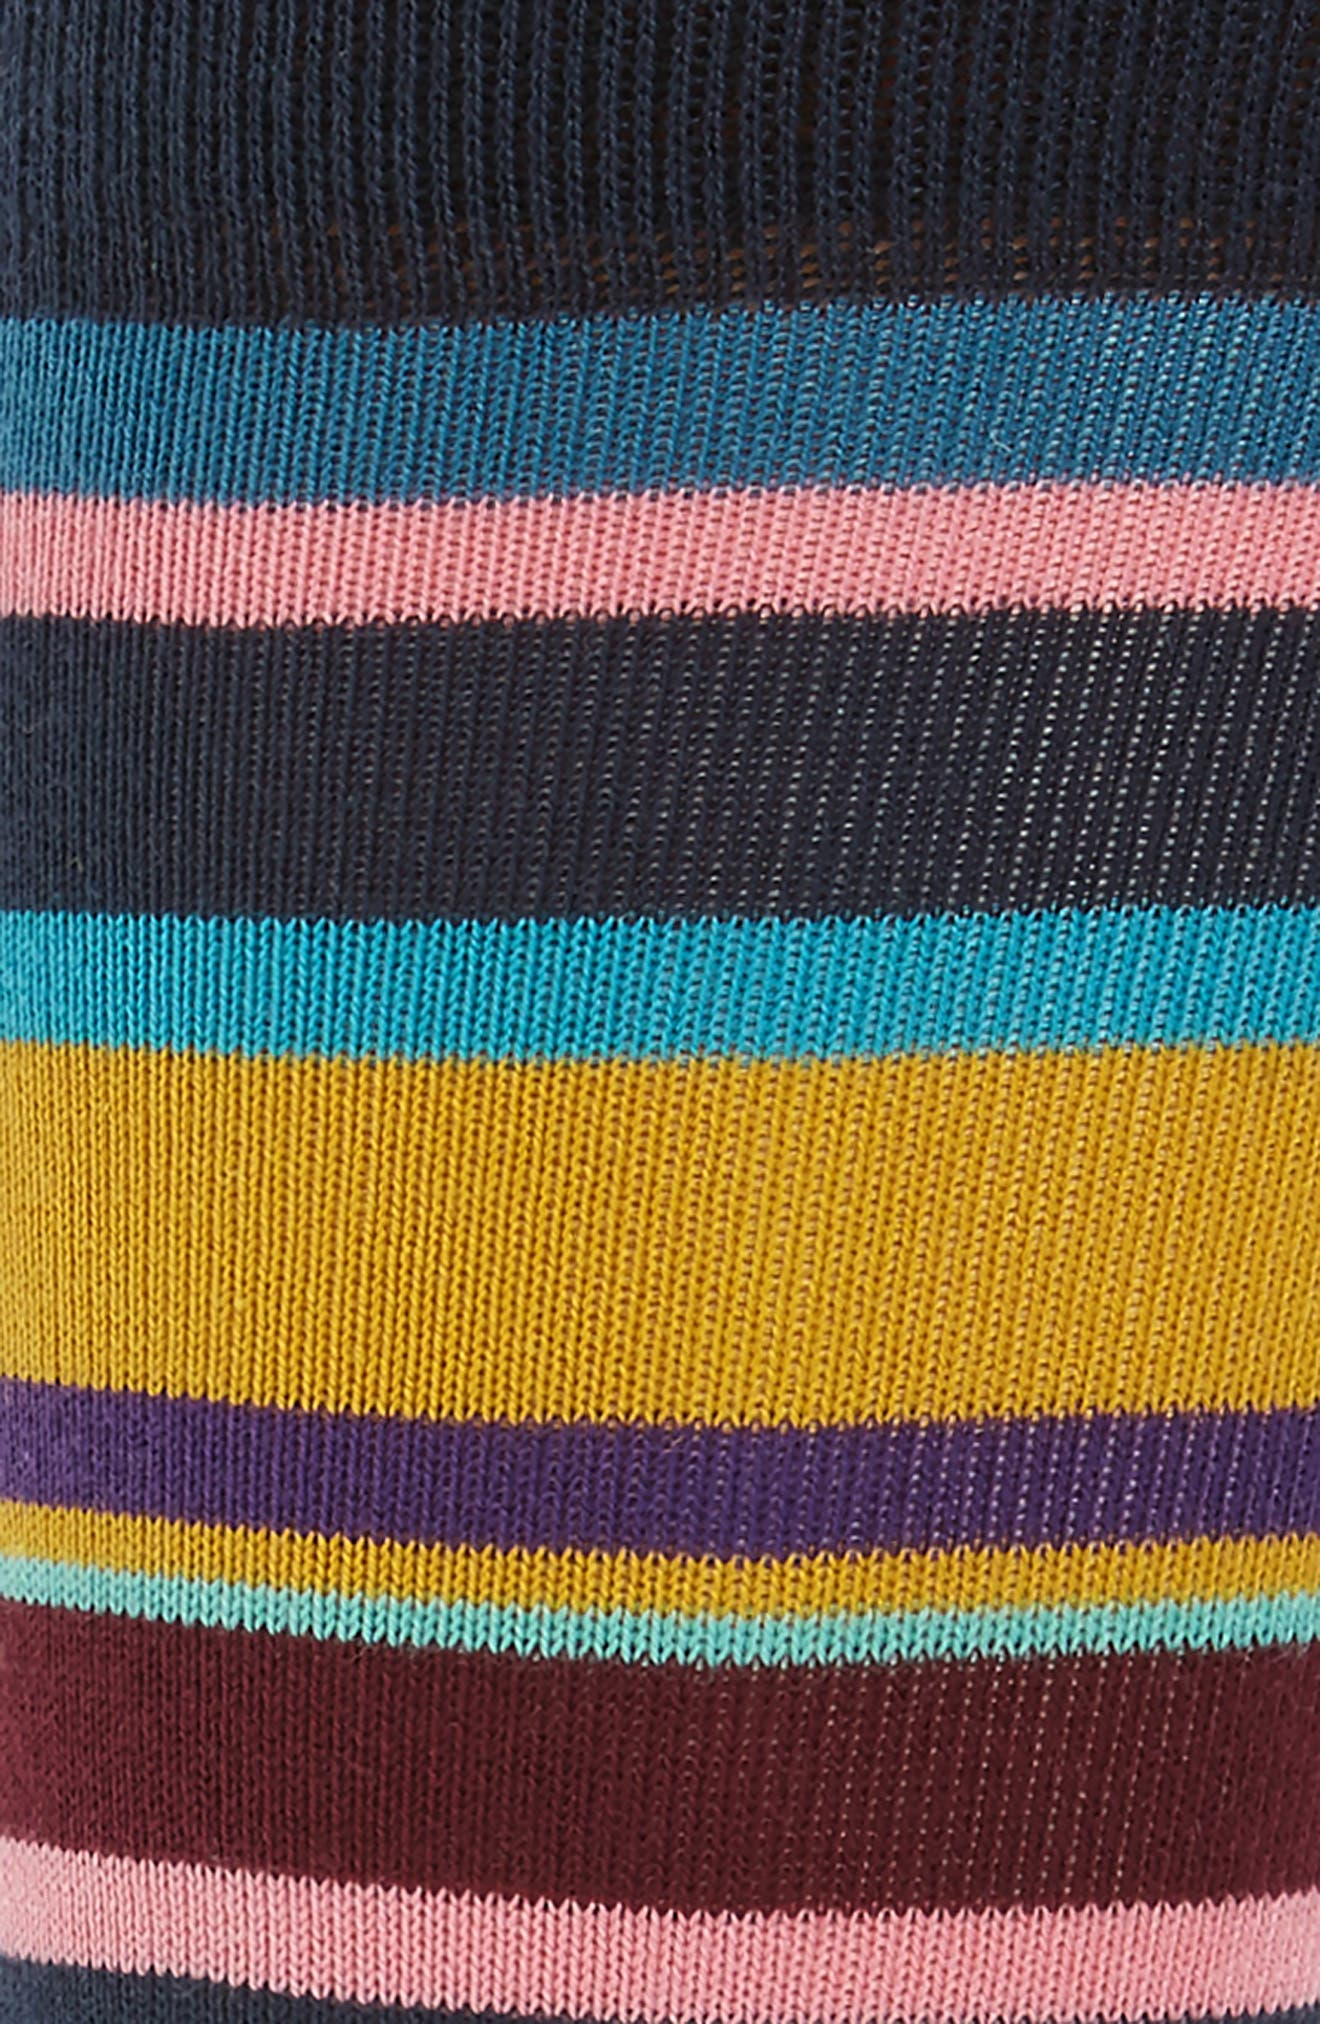 Stripe Socks,                             Alternate thumbnail 2, color,                             Blue